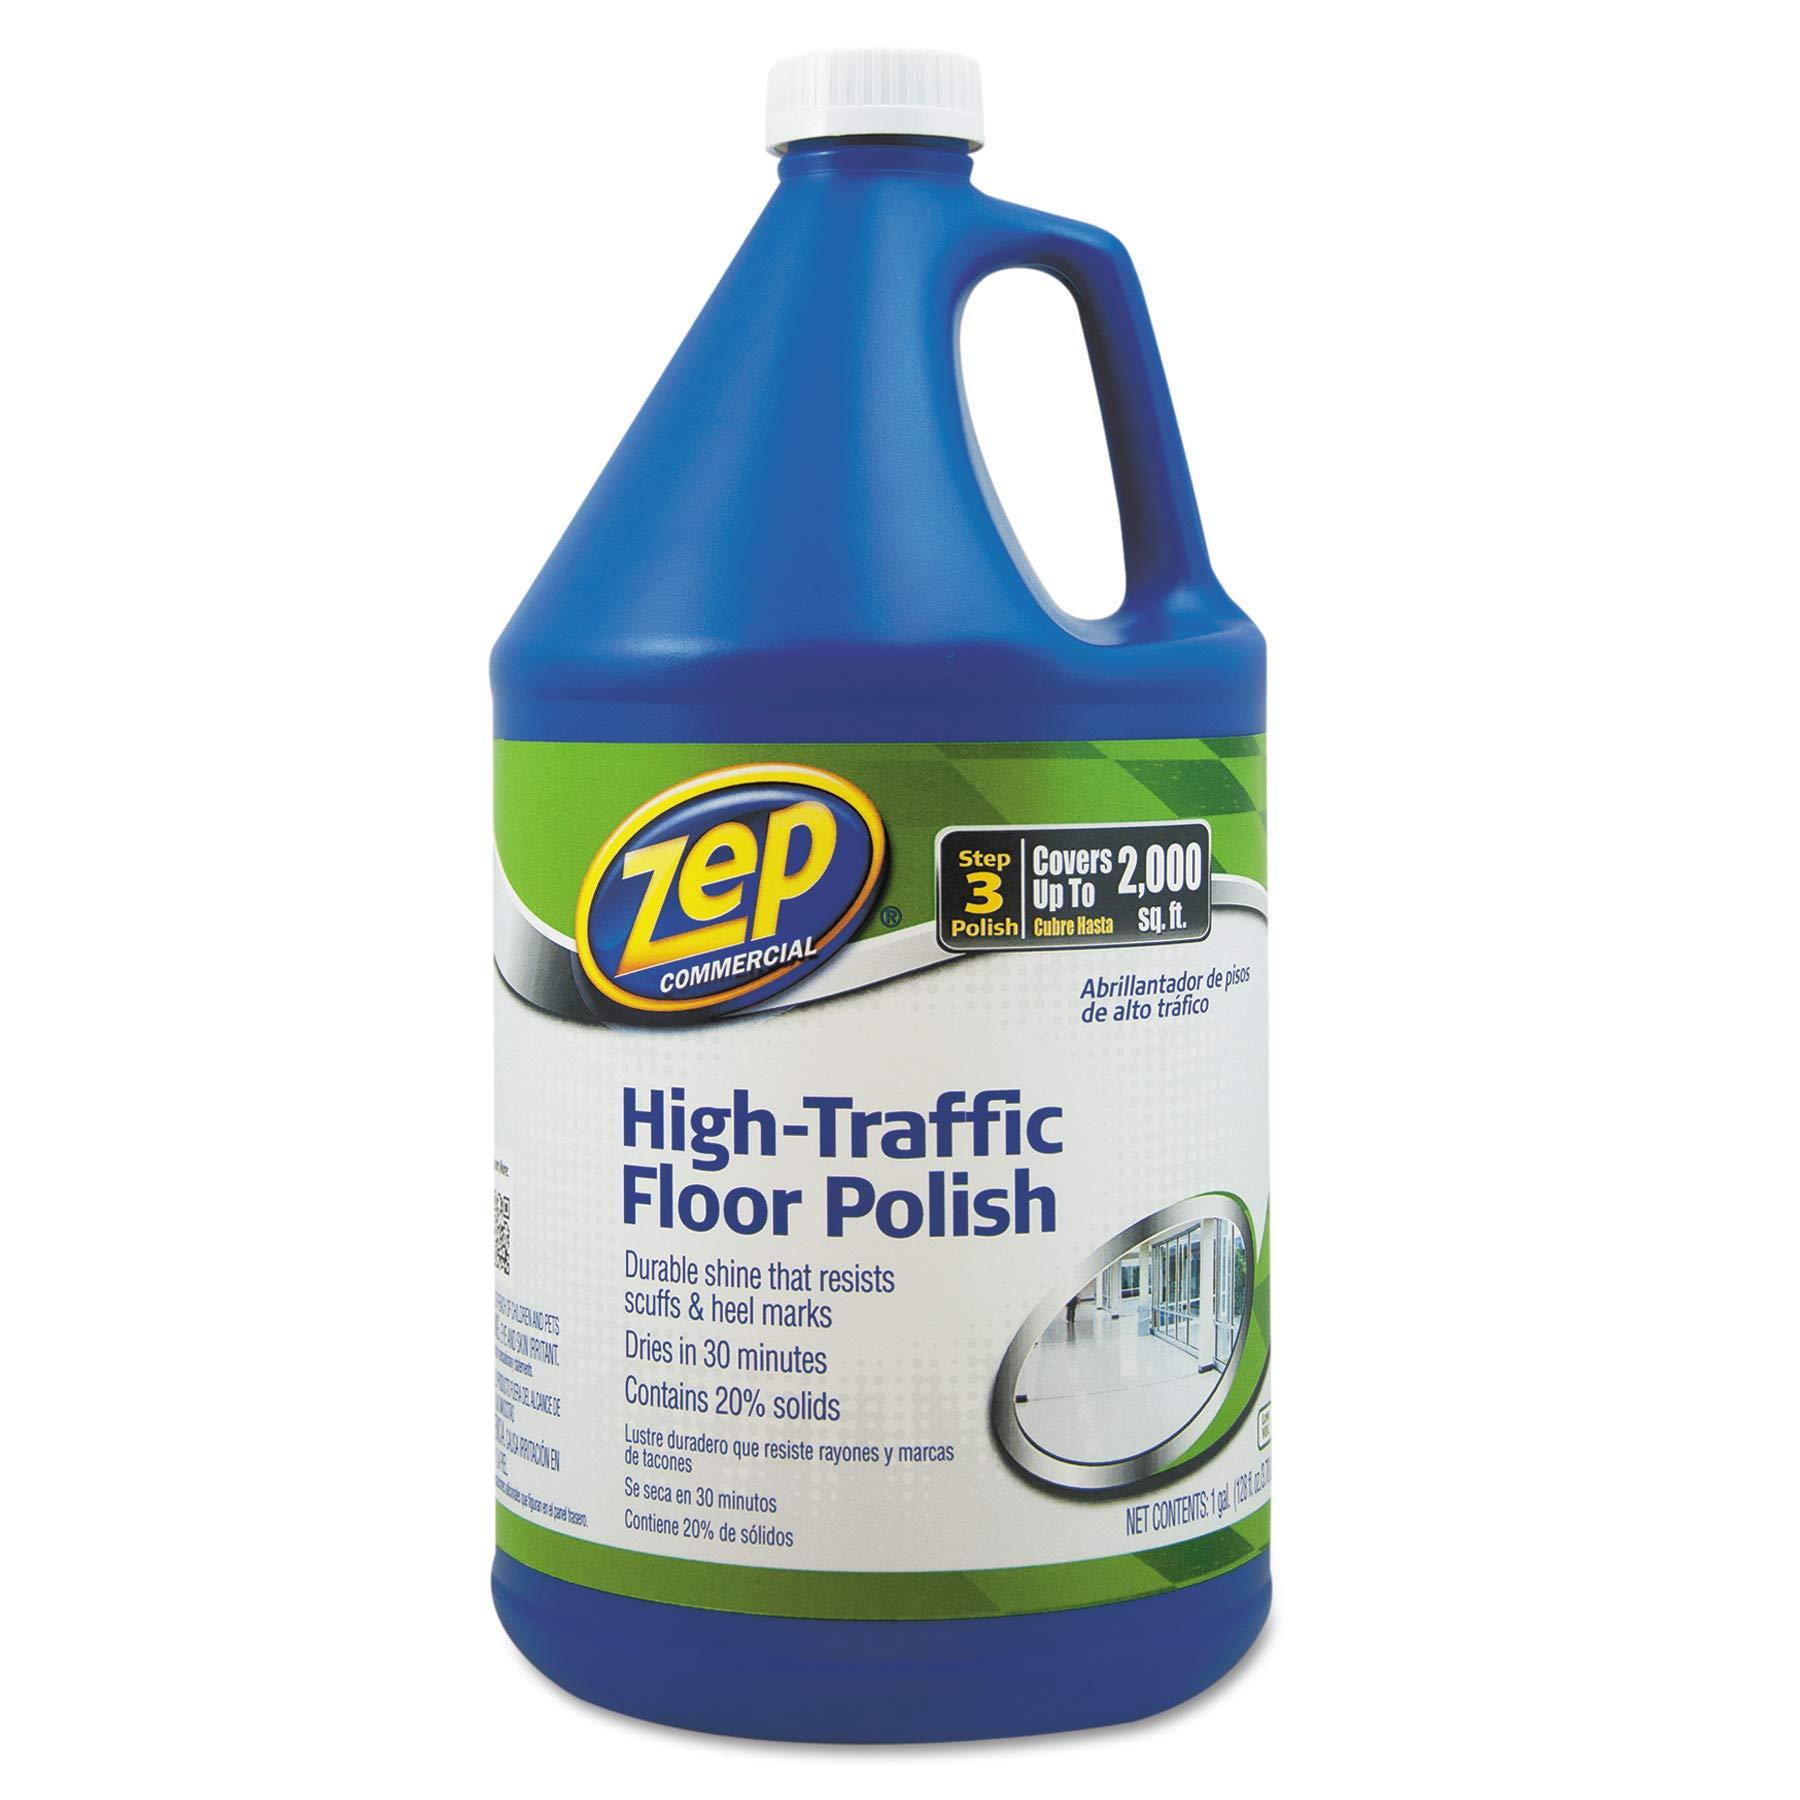 Zep Commercial 1044999 High Traffic Floor Polish, 1 gal Bottle